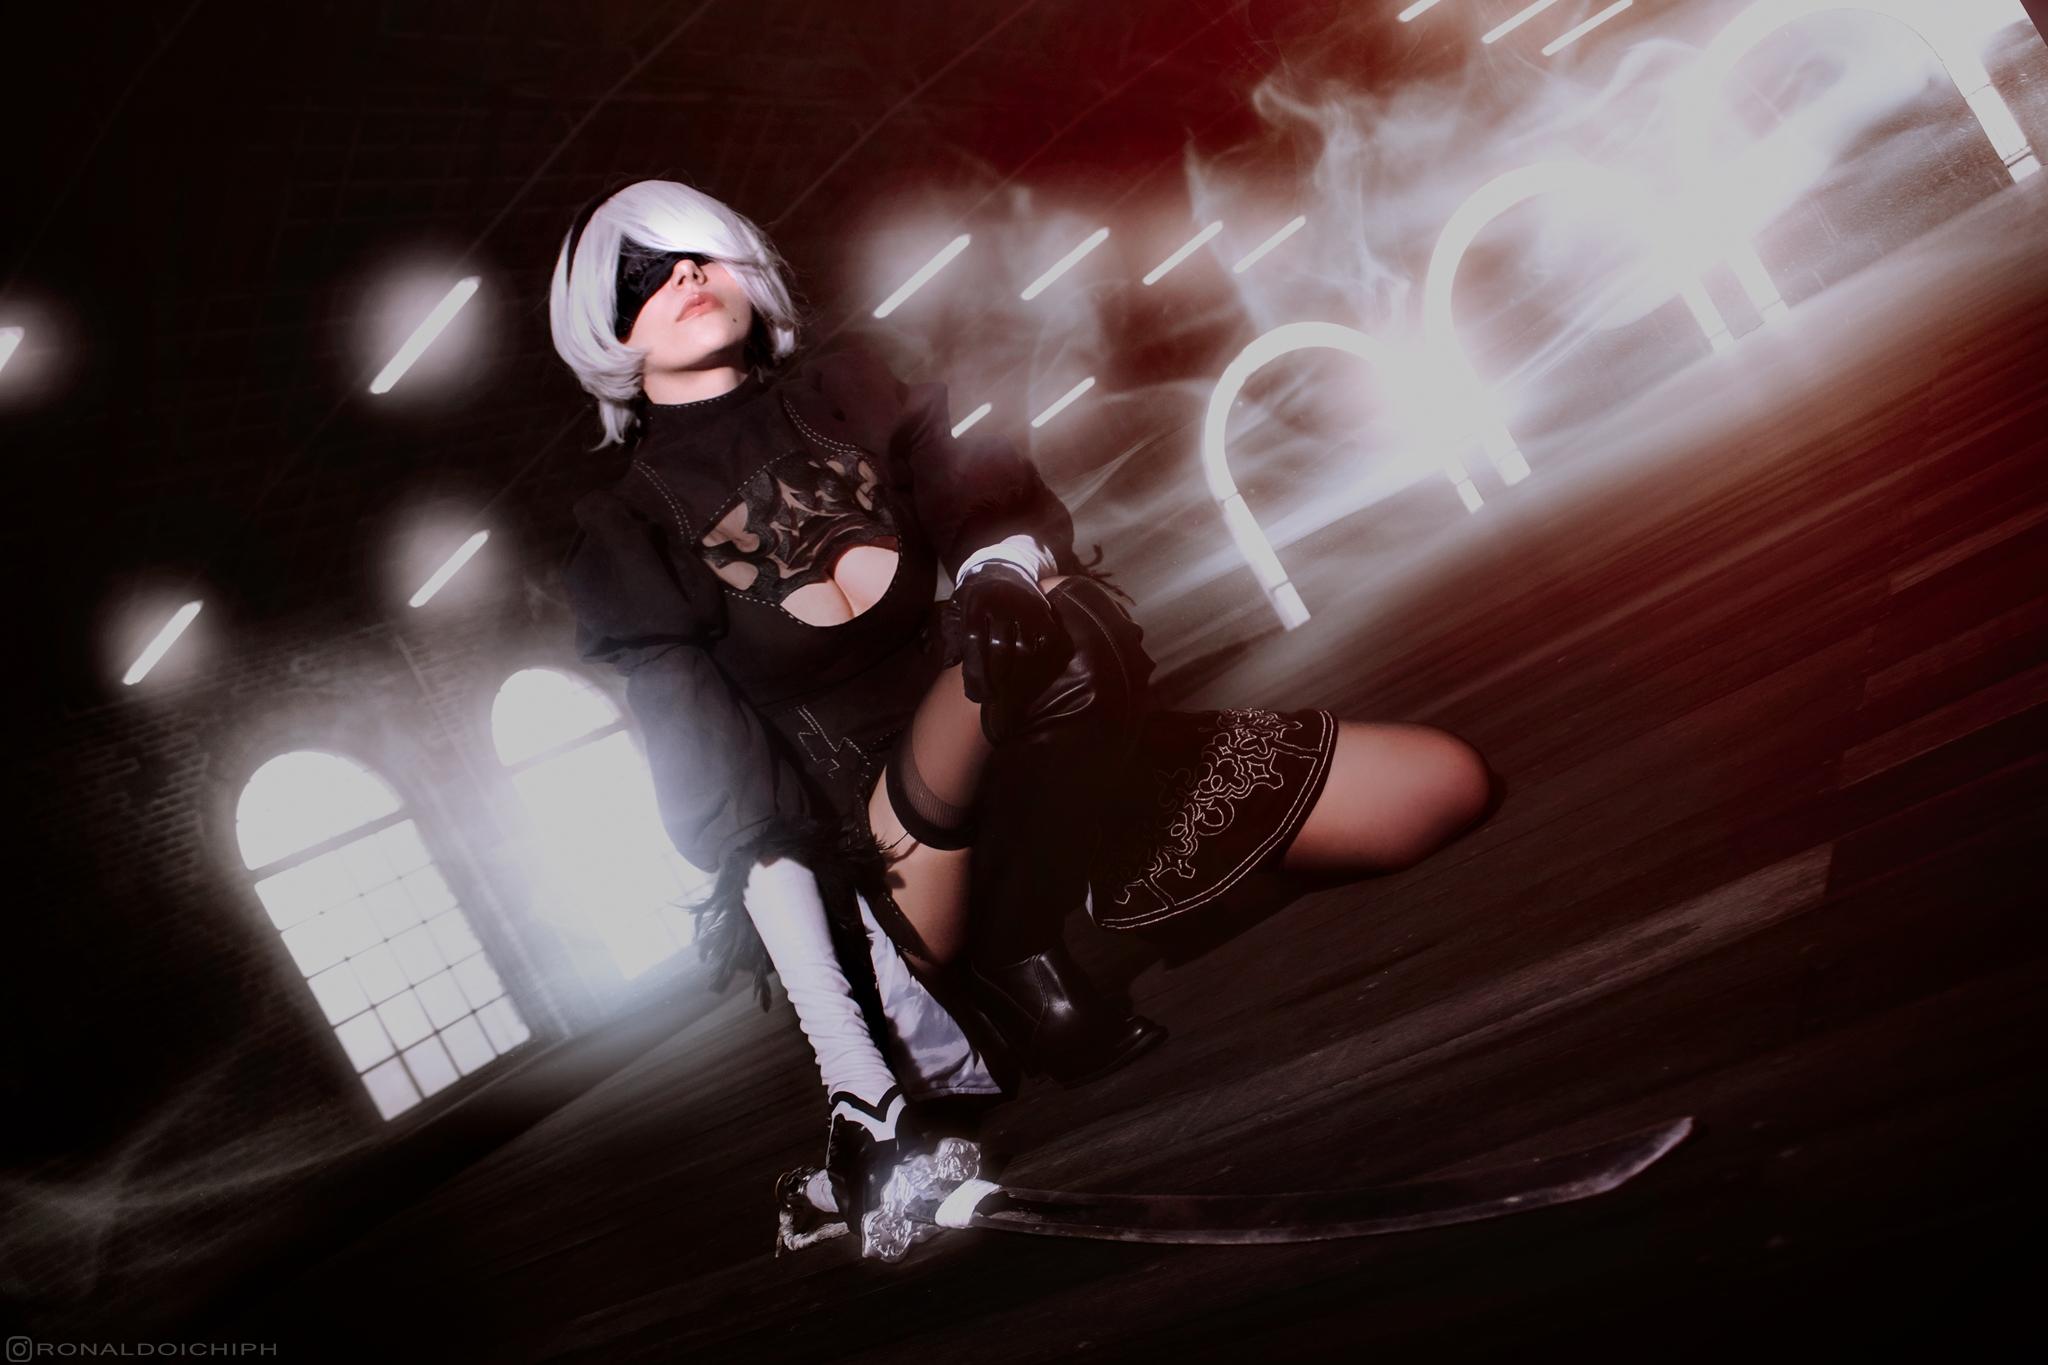 2B YoRHa No.2 Type B cosplay from Nier Automata | cosplayer Yun | cosplay photography by brazilian photographer Ronaldo Ichi.